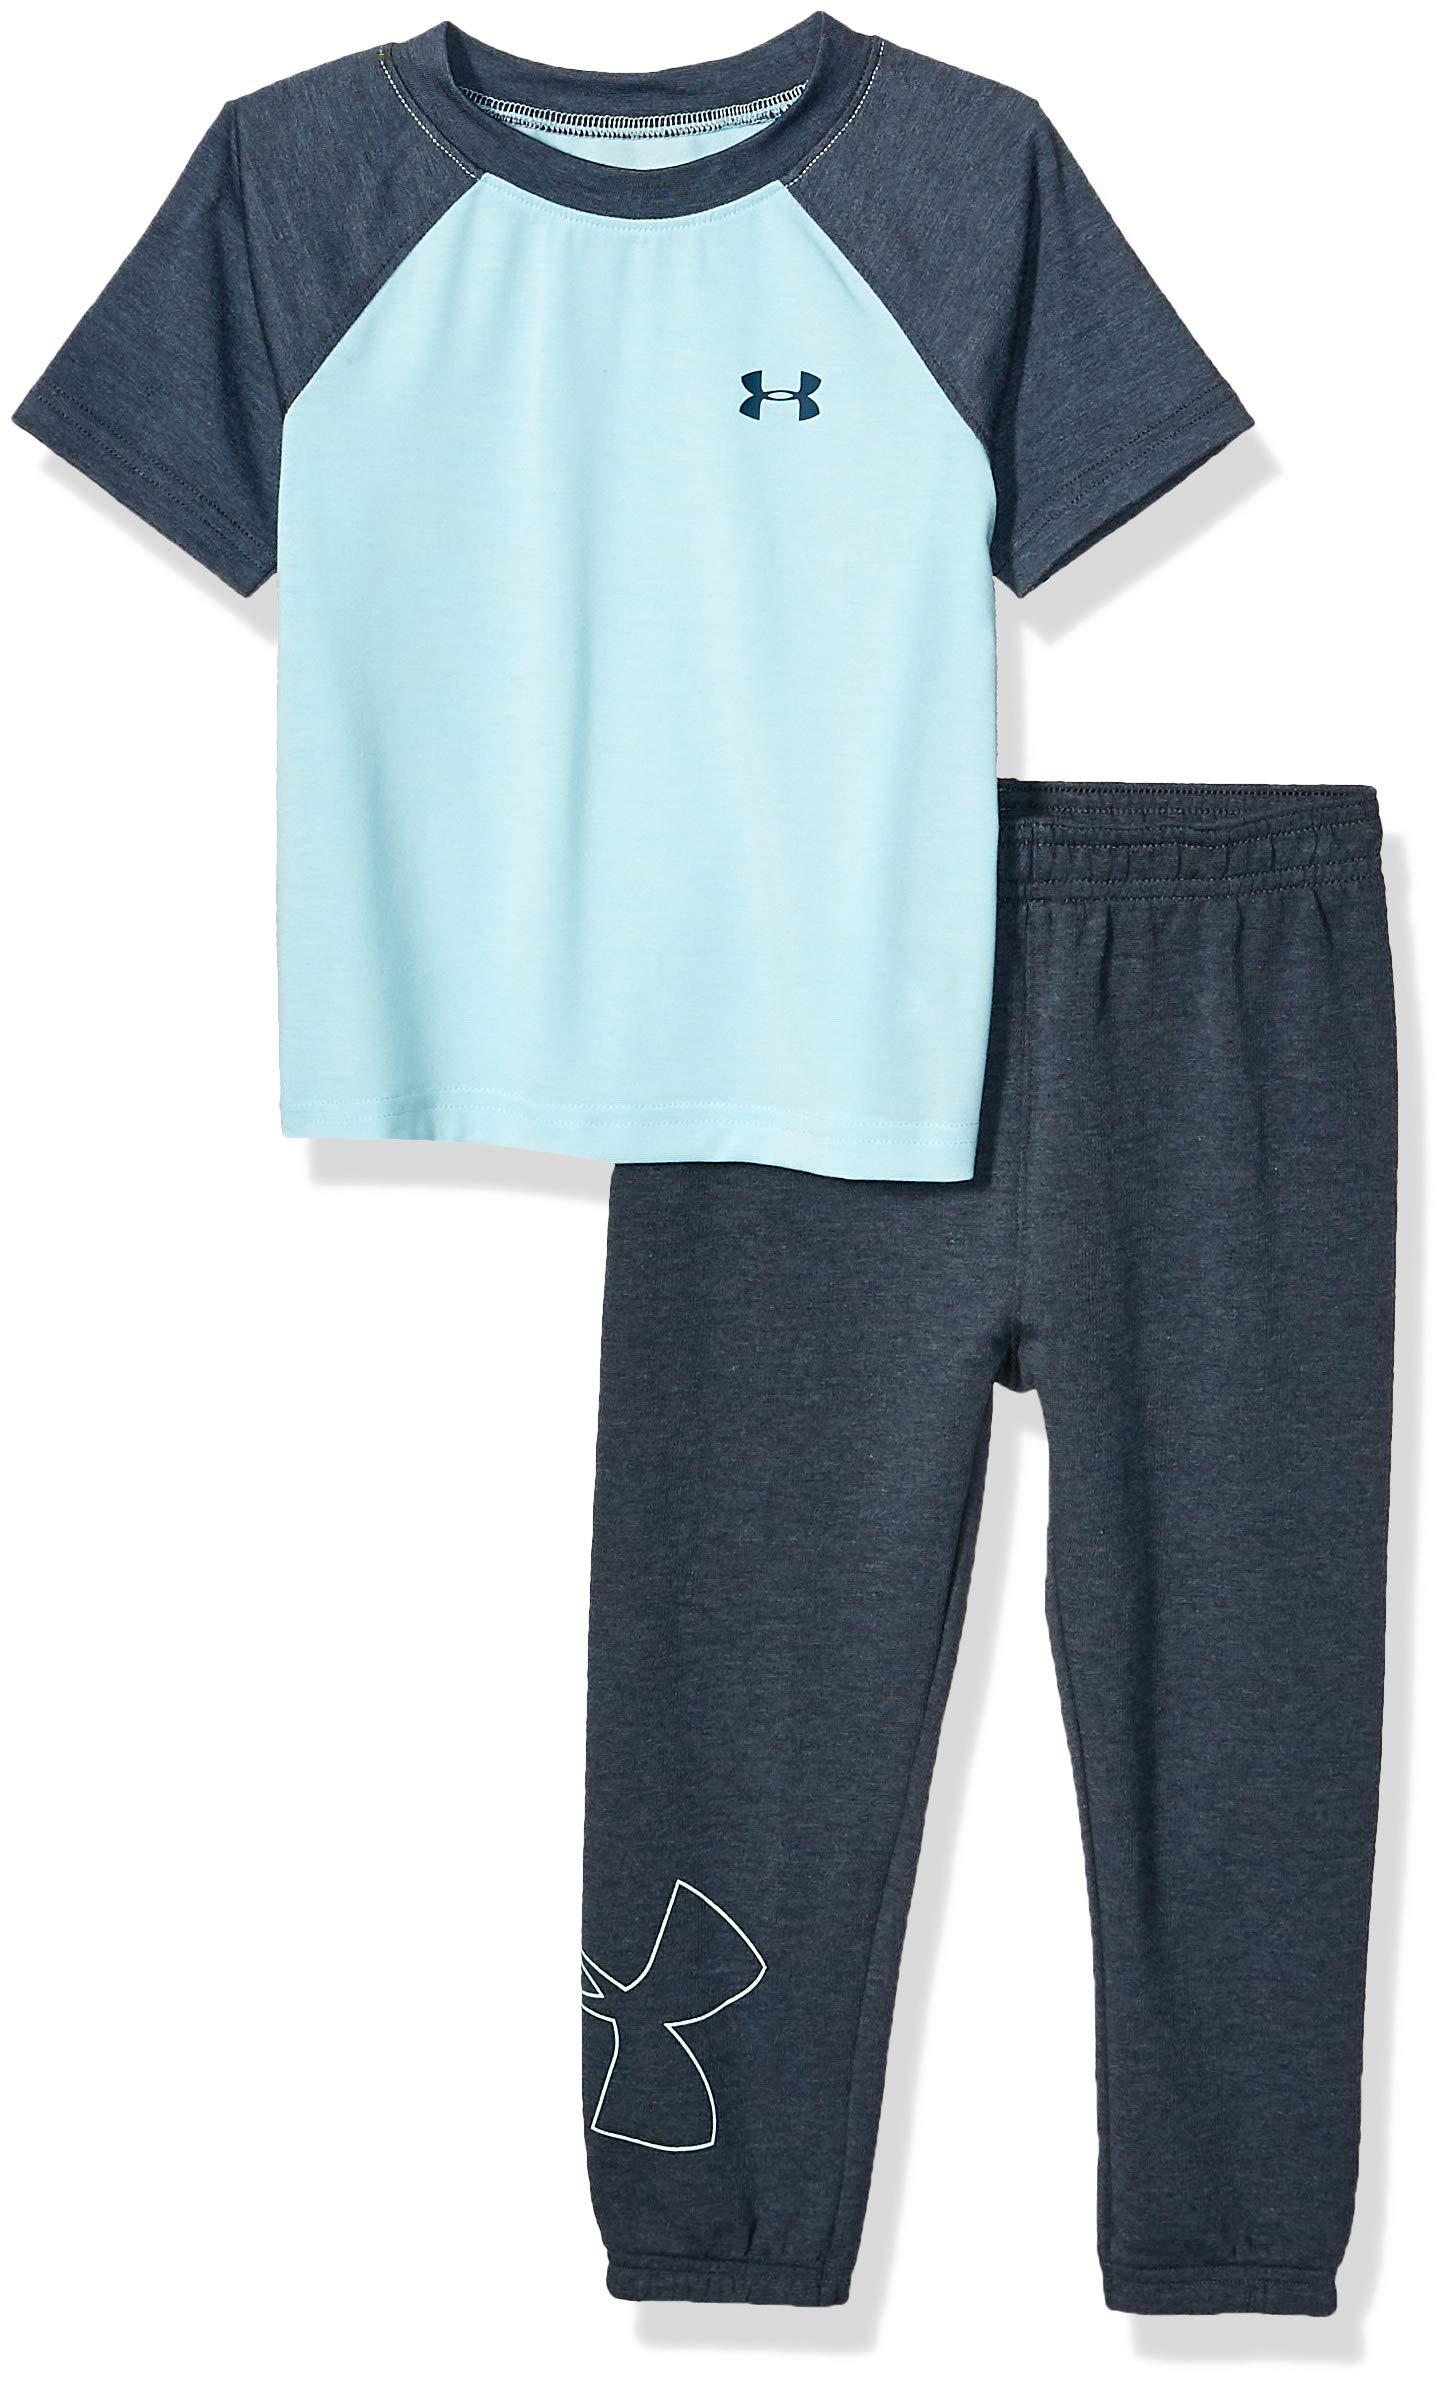 Under Armour Boys' Short Sleeve Tee and Pant Set